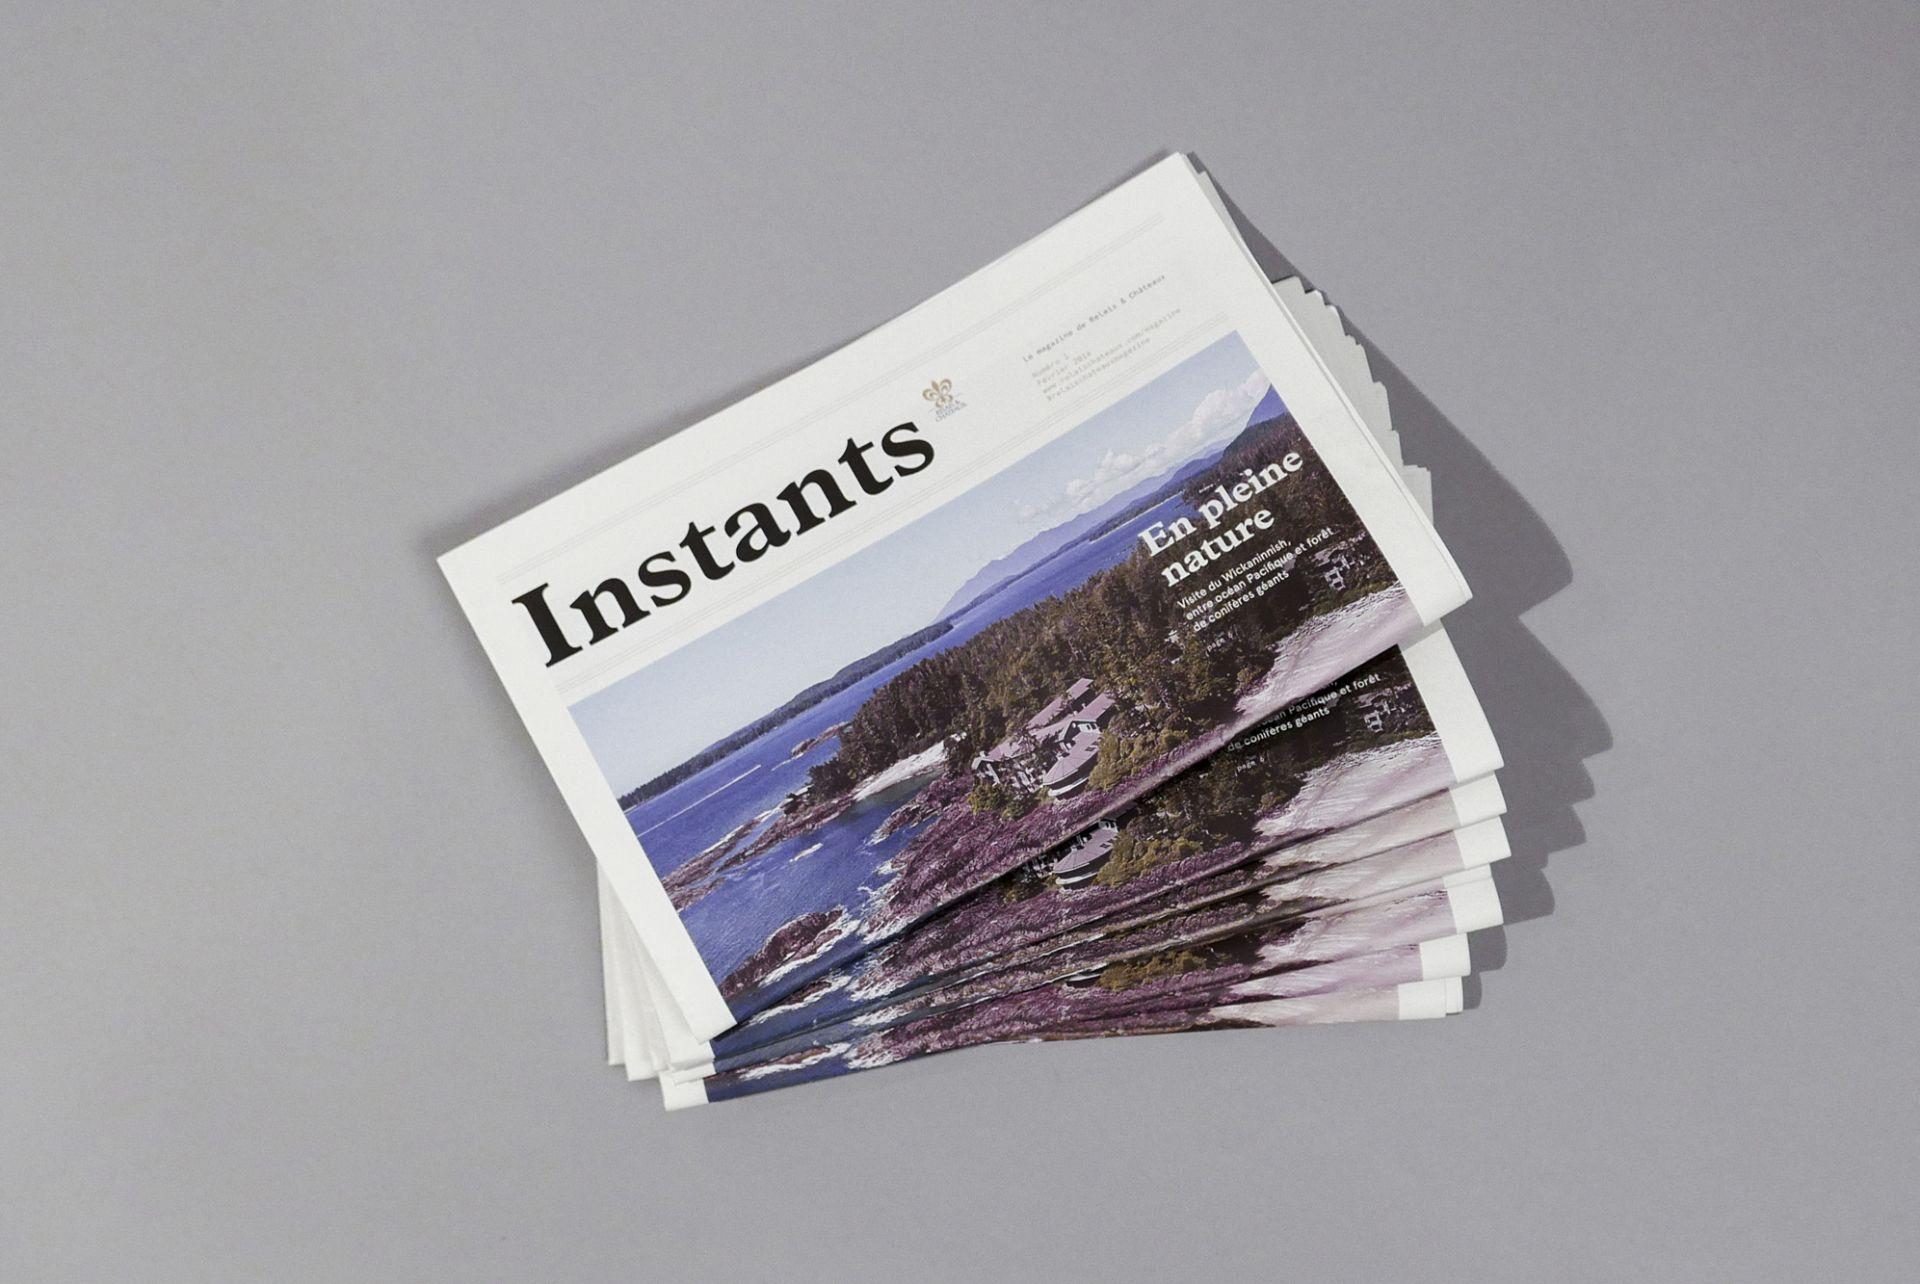 Yorgo co instants online print magazine - Www relaischateaux com creation ...